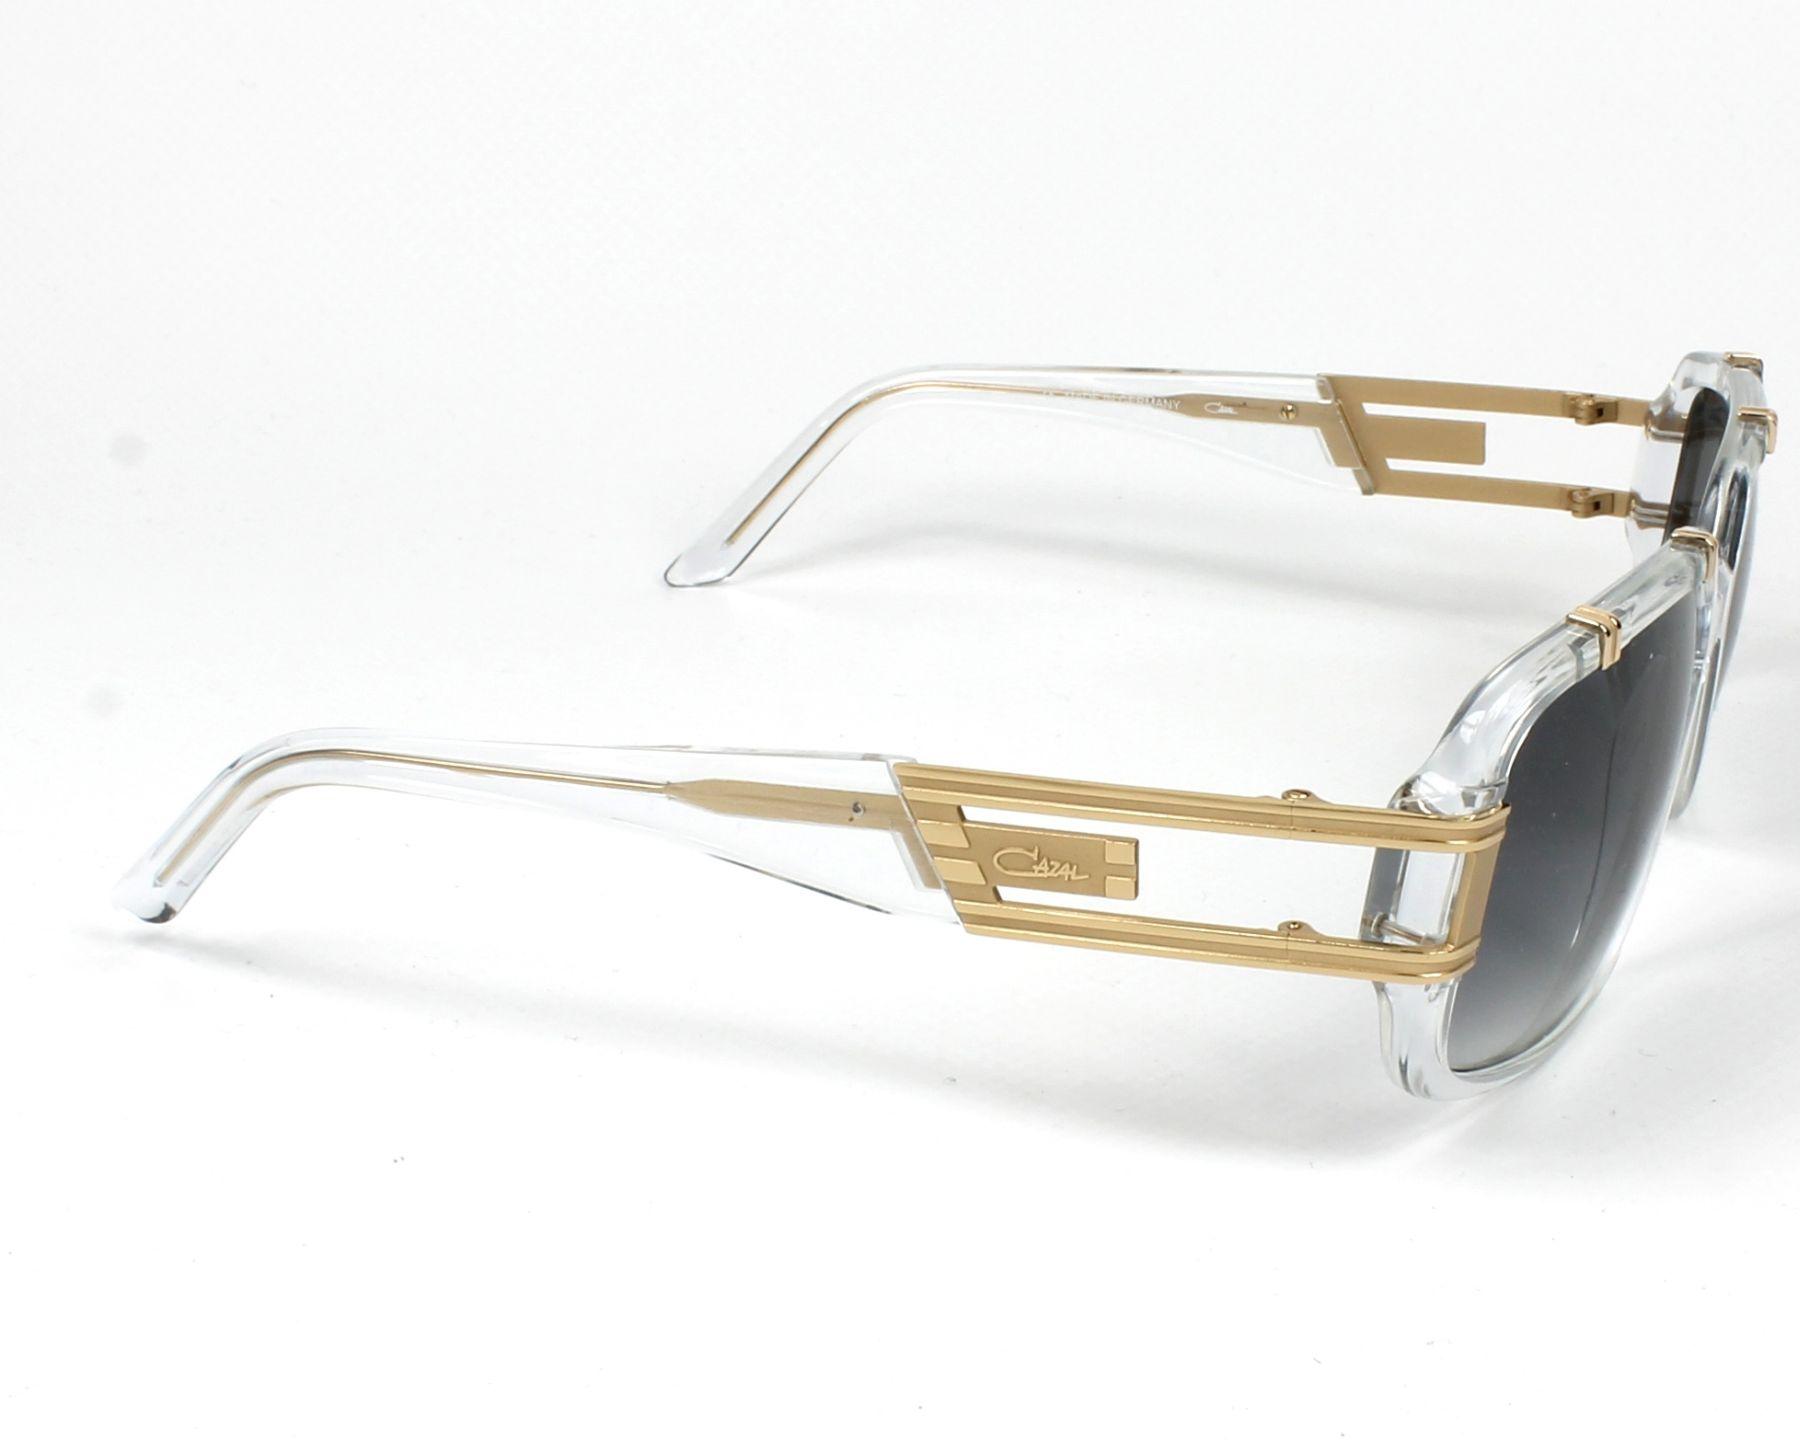 5cc7bfaa615 Sunglasses Cazal 8012 065 62-15 Crystal Gold side view